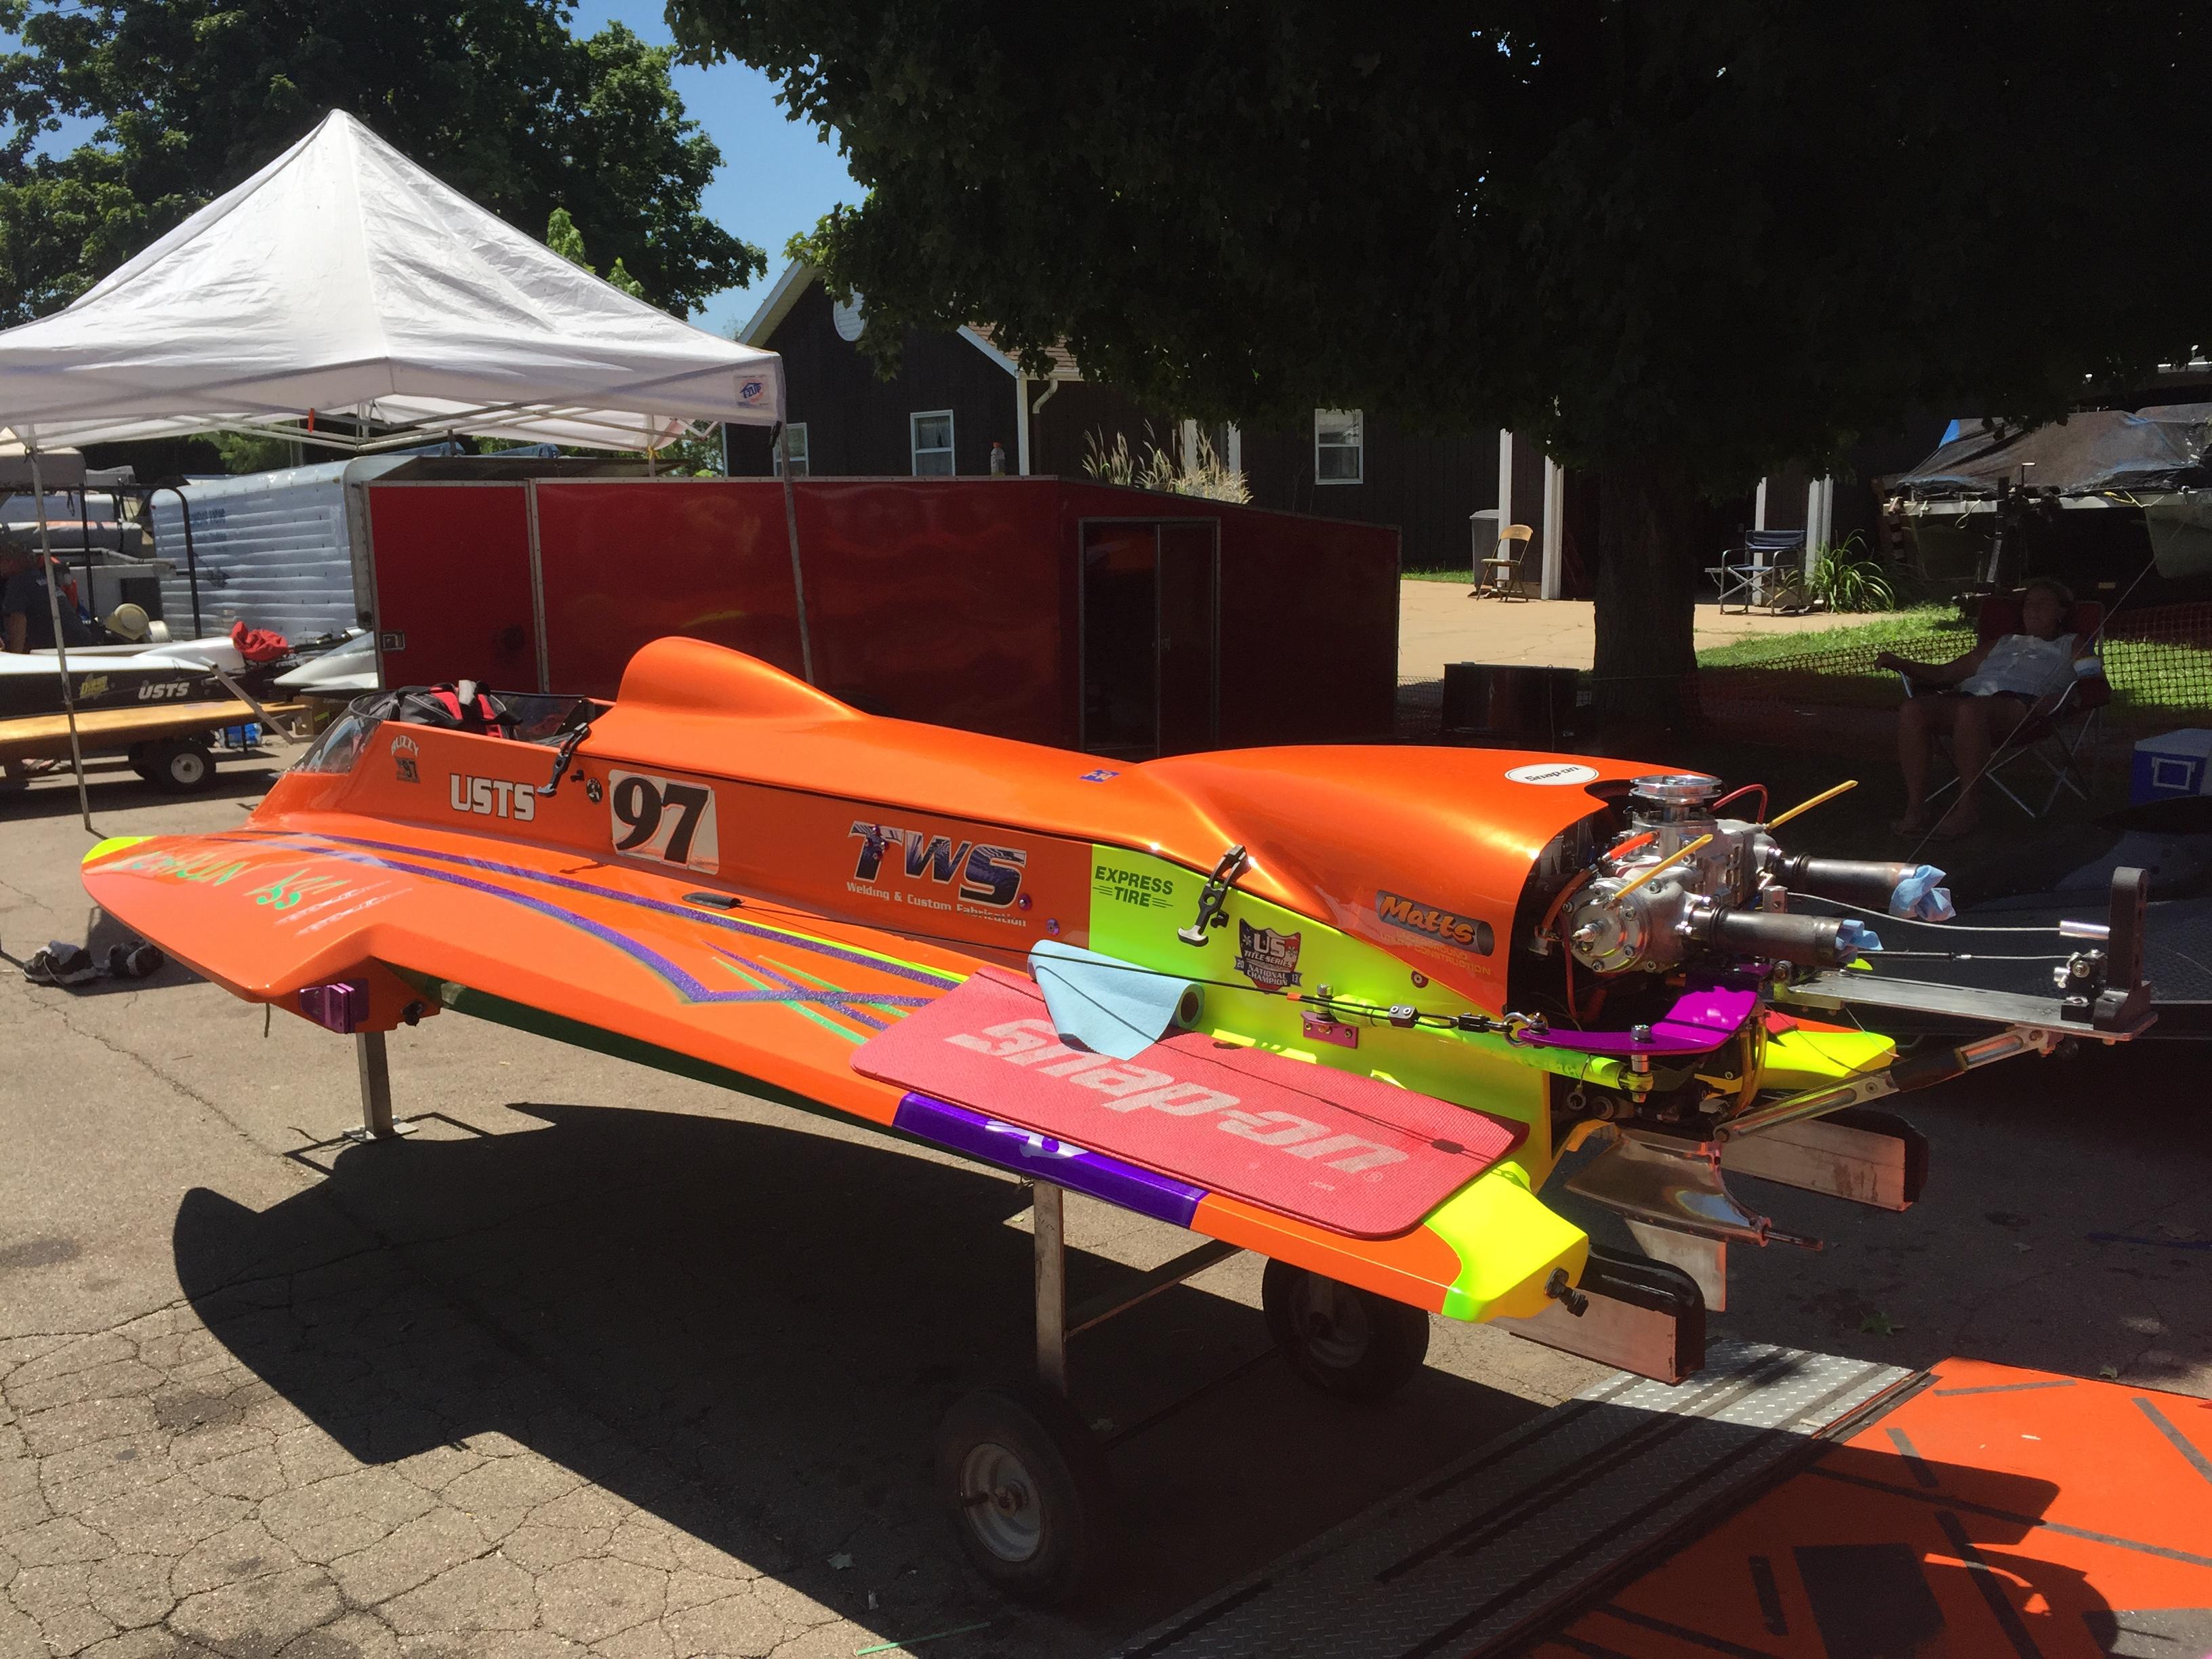 Orange Boat at Depue Boat Race in Paddock Area